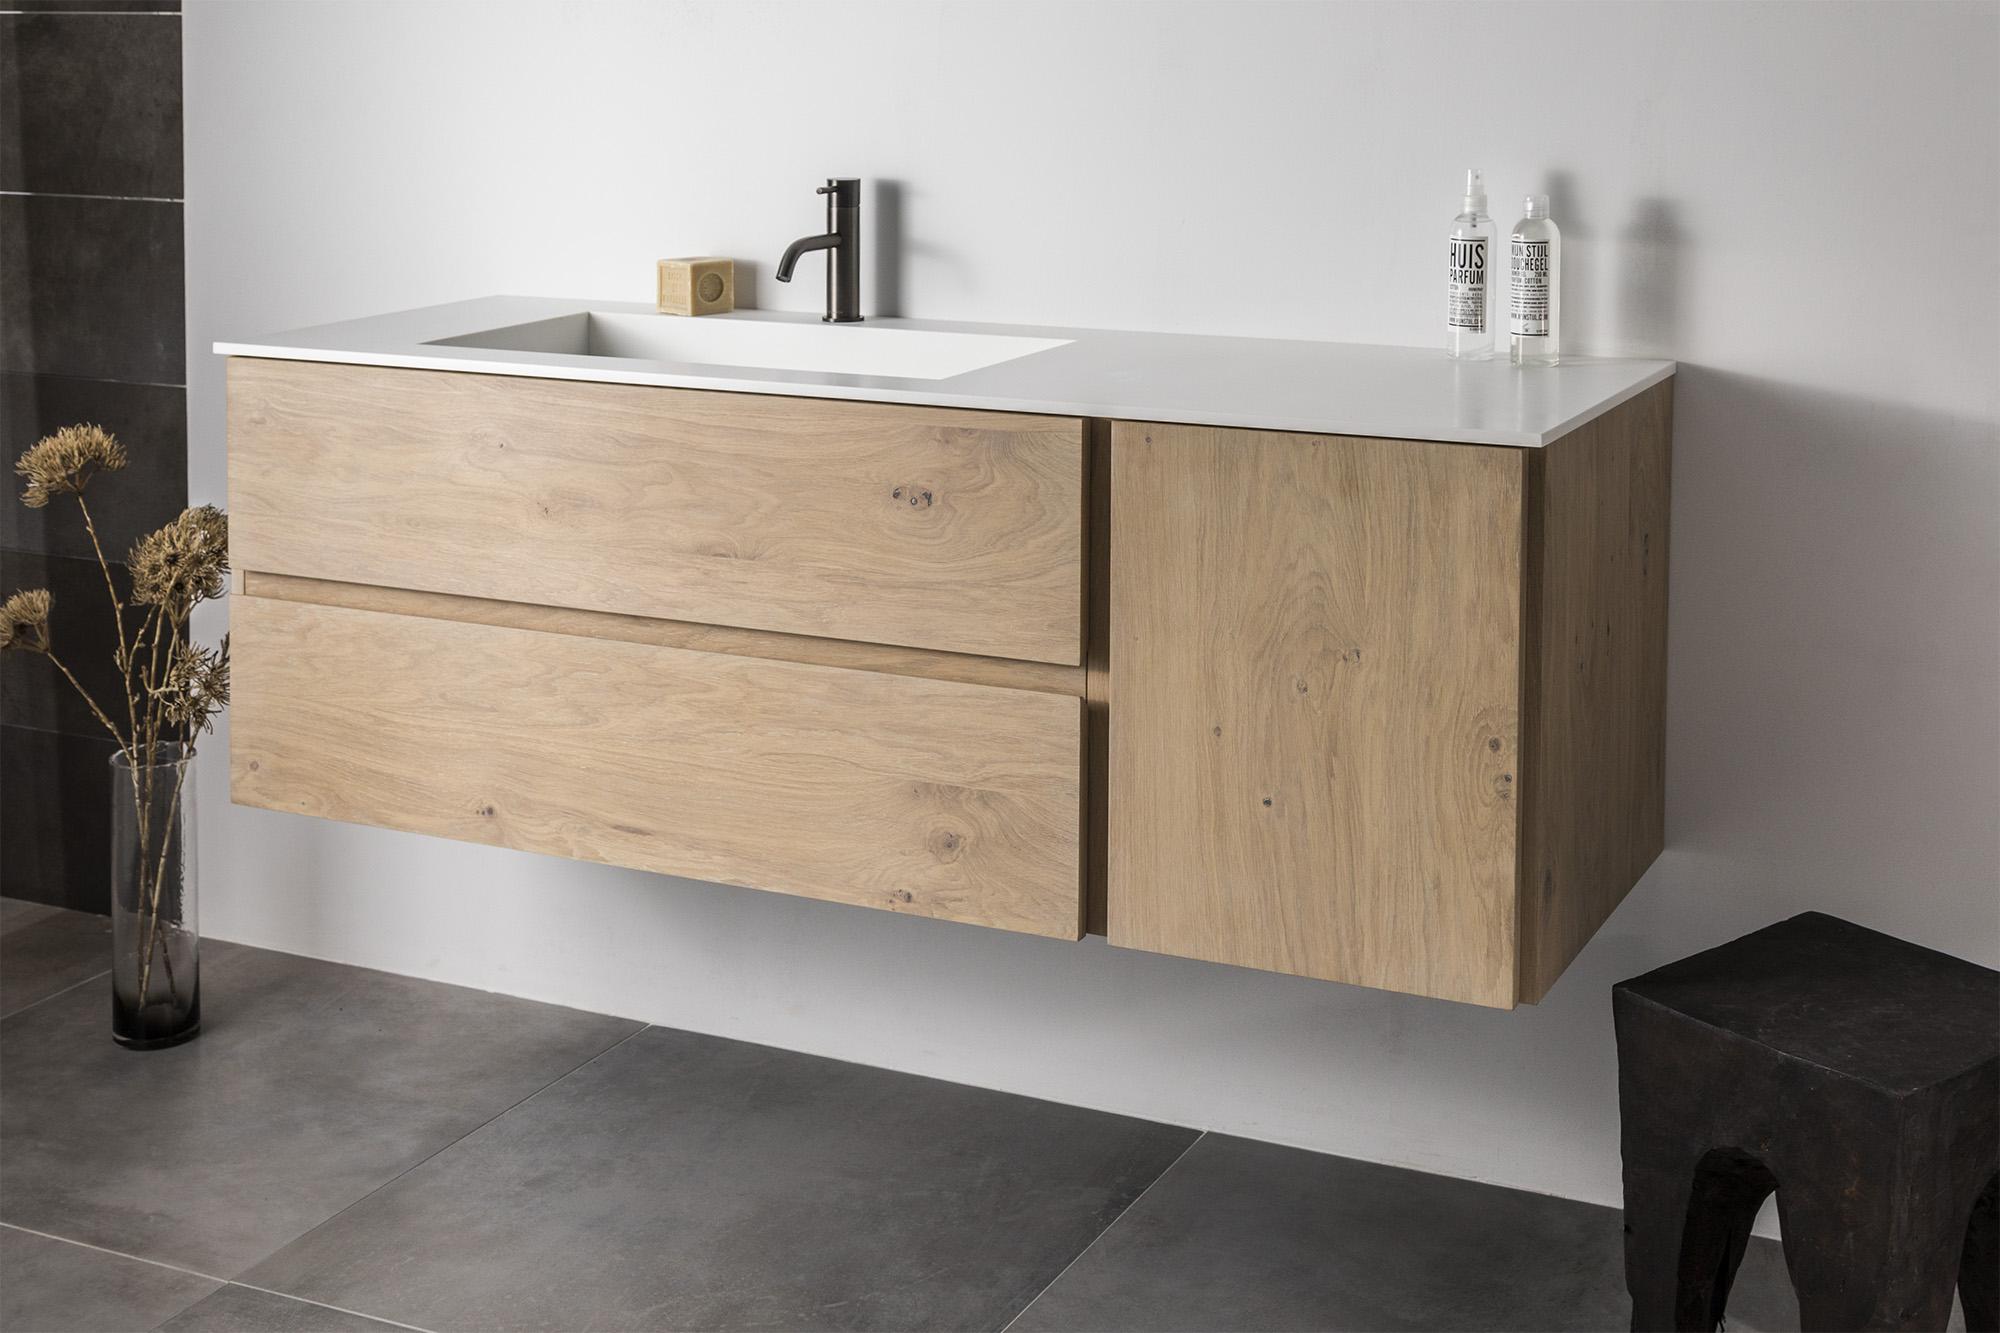 Catania Badkamermeubel solid surface design badkamers en keukens